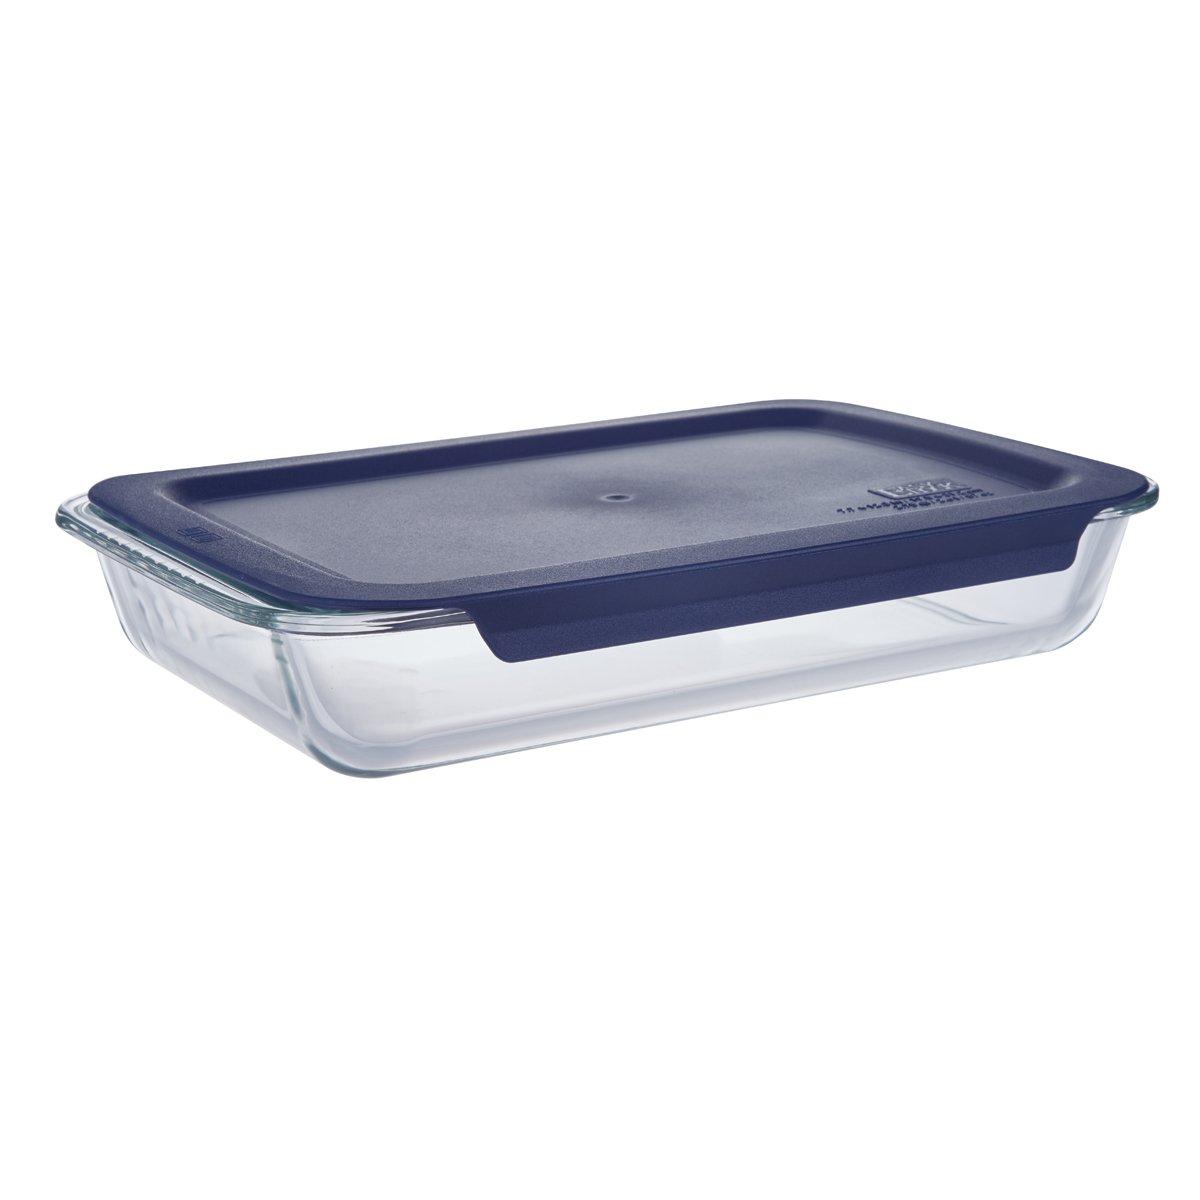 Basics 2.36 Quart Glass Oblong Baking Dish with Blue Plastic Lid - 13.8 x 8.7 x 2.5 inches